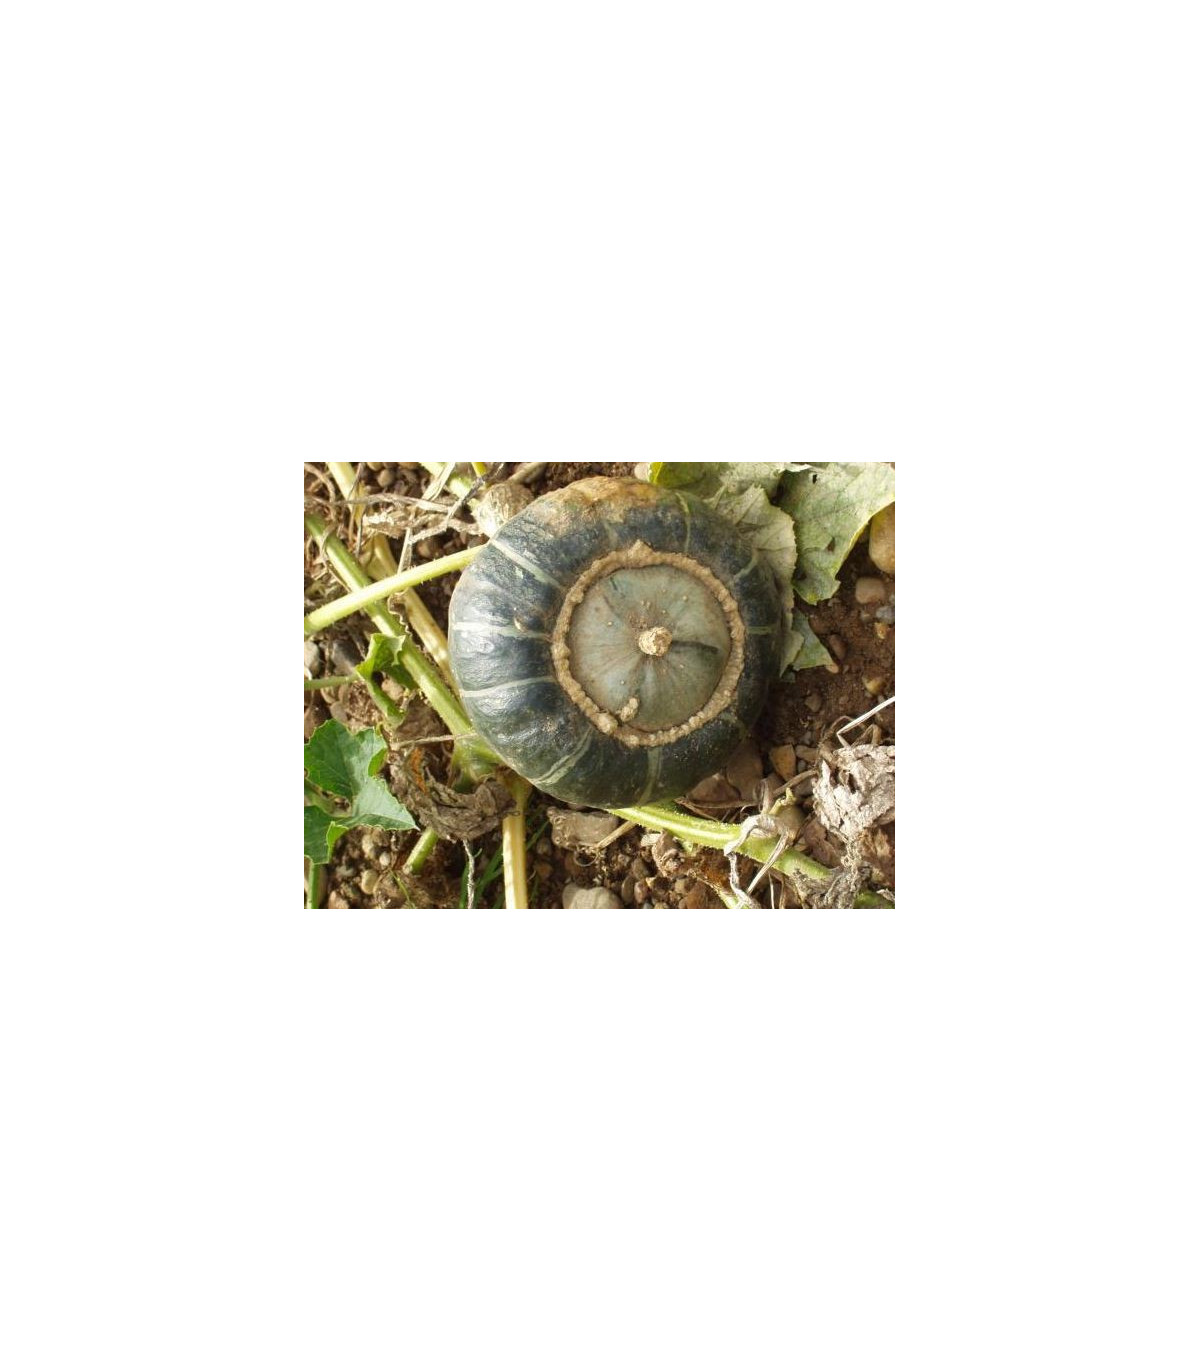 Tykev velkoplodá - rostlina Cucurbita maxima - prodej semen tykve - 10 ks